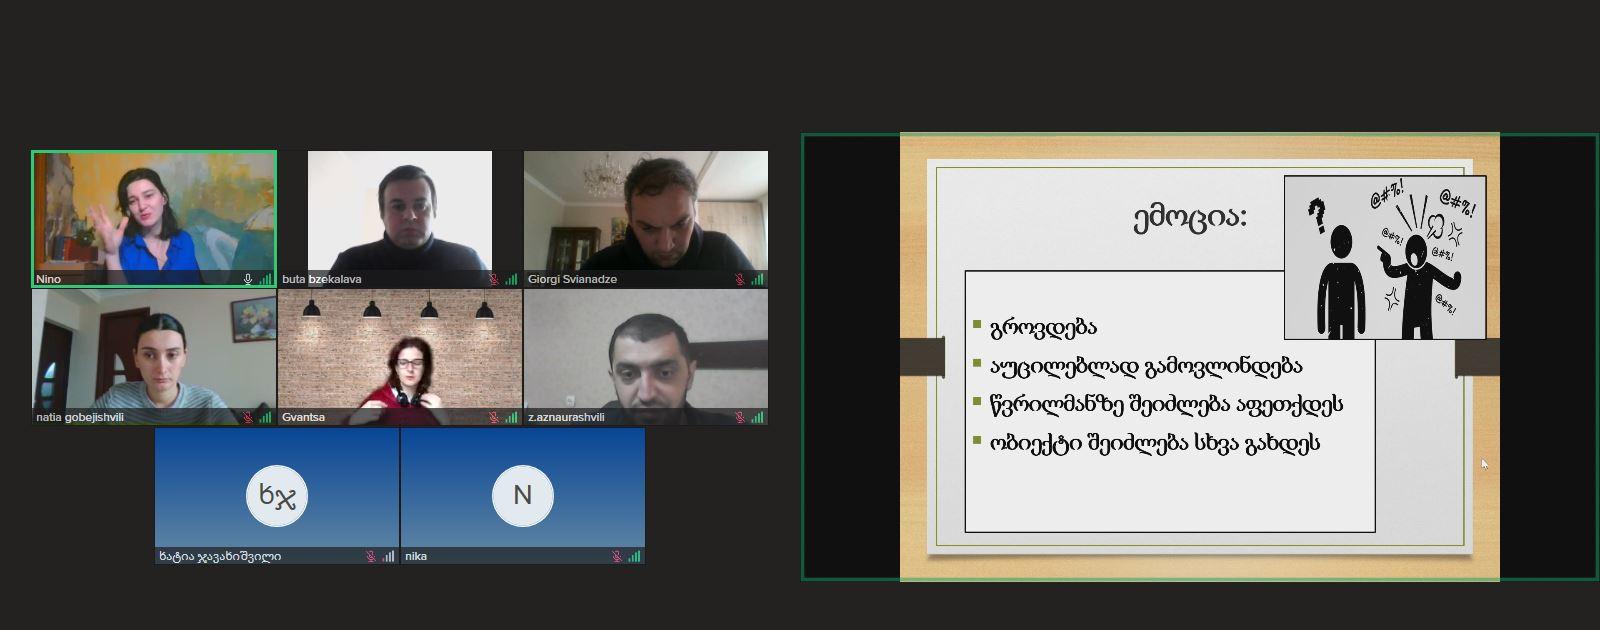 Training on the methods of effective communication